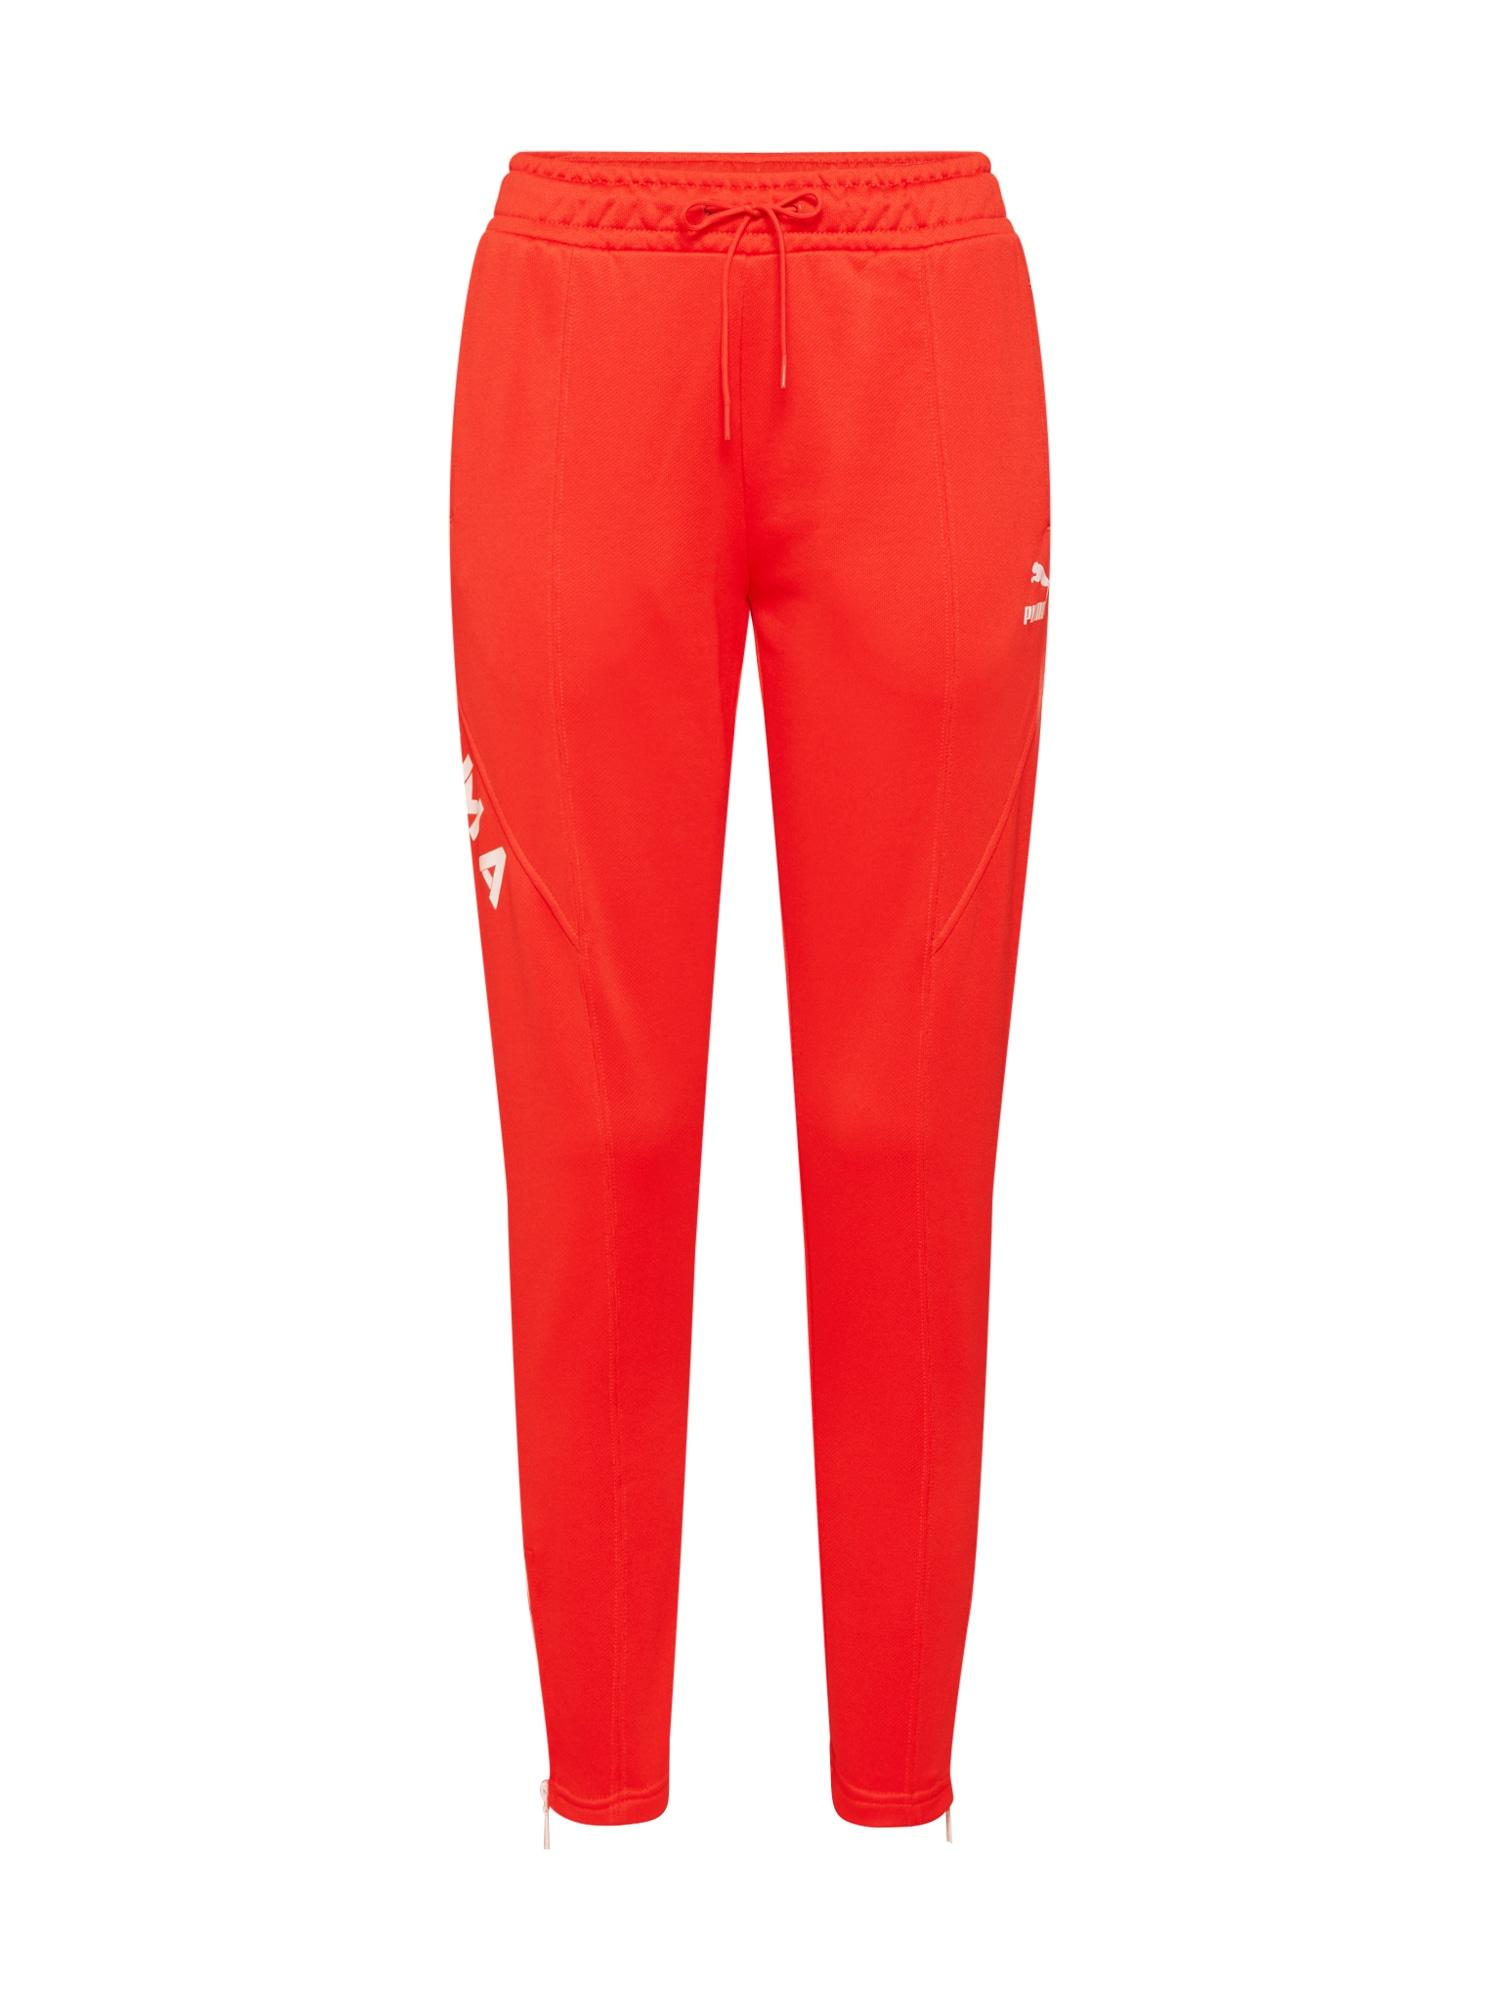 Kalhoty XTG 94 červená bílá PUMA